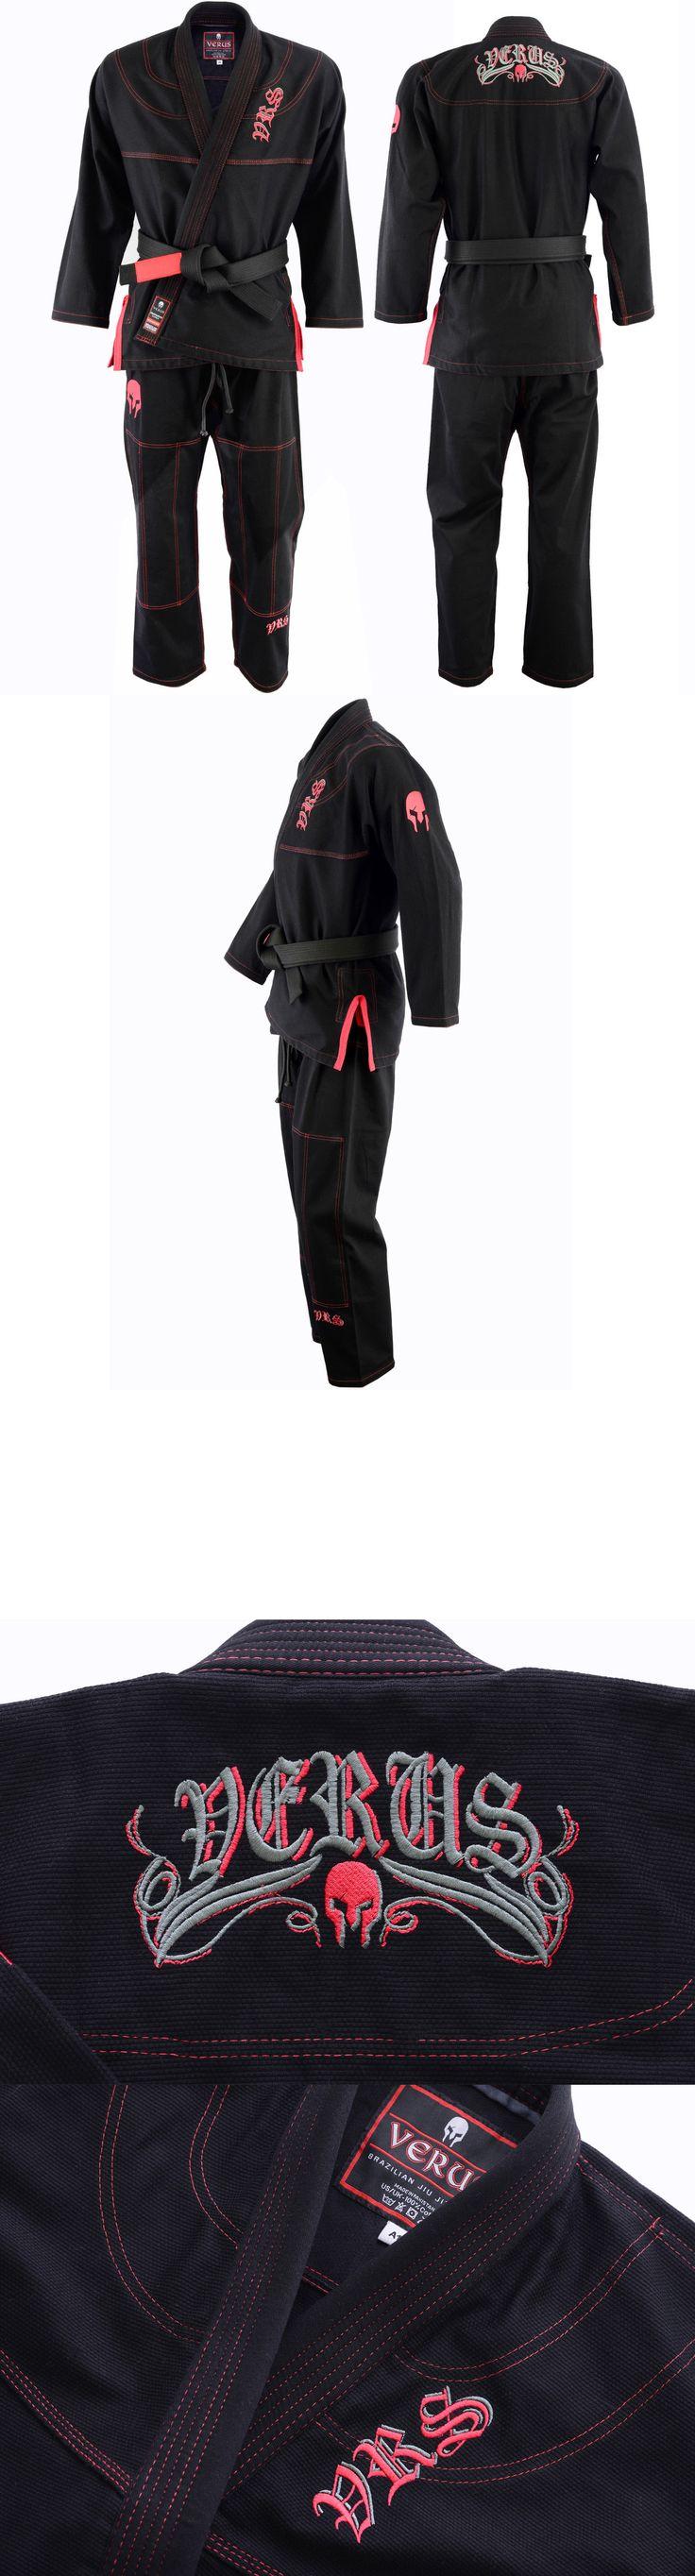 Uniforms and Gis 179774: Verus Bjj Gi Spartacus Episode Ii Pearl Weave Brazilian Grappling Jiu Jitsu Gi -> BUY IT NOW ONLY: $67.95 on eBay!